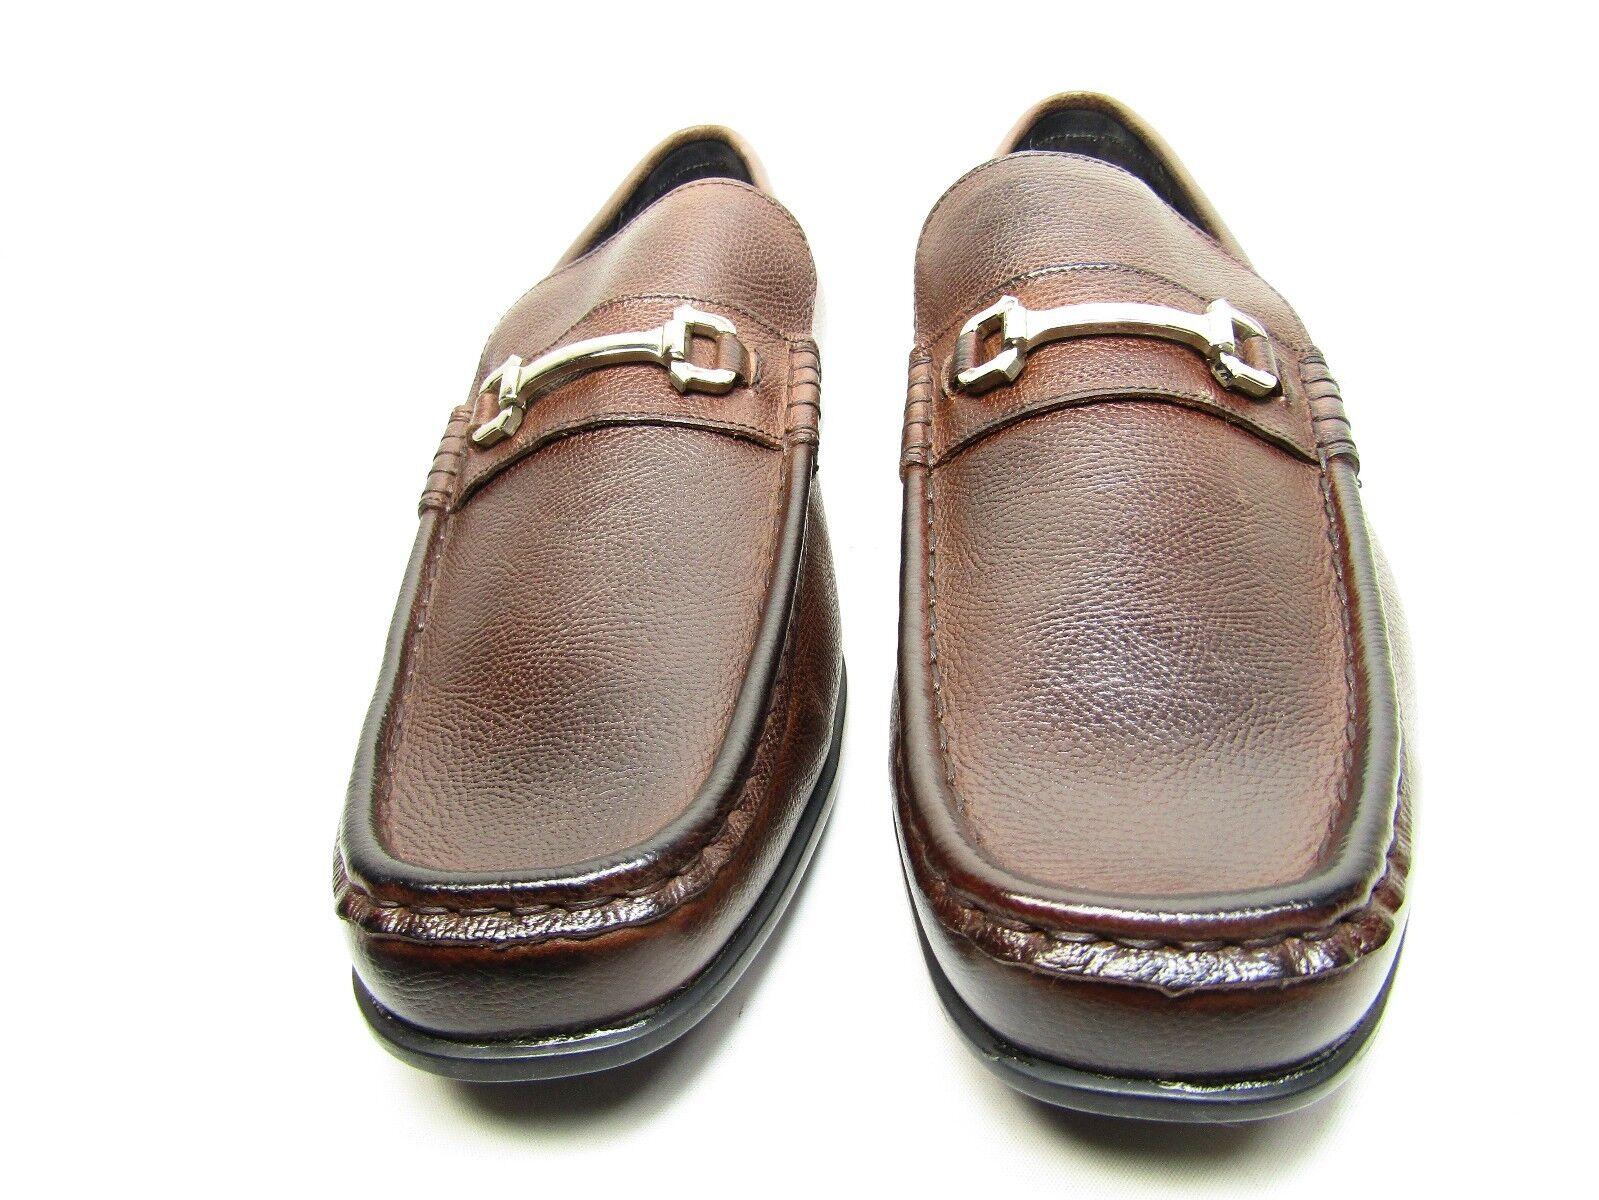 Stacy Adams Para Hombre Ellory Slip-on Loafer Marrón Talla 11.5M